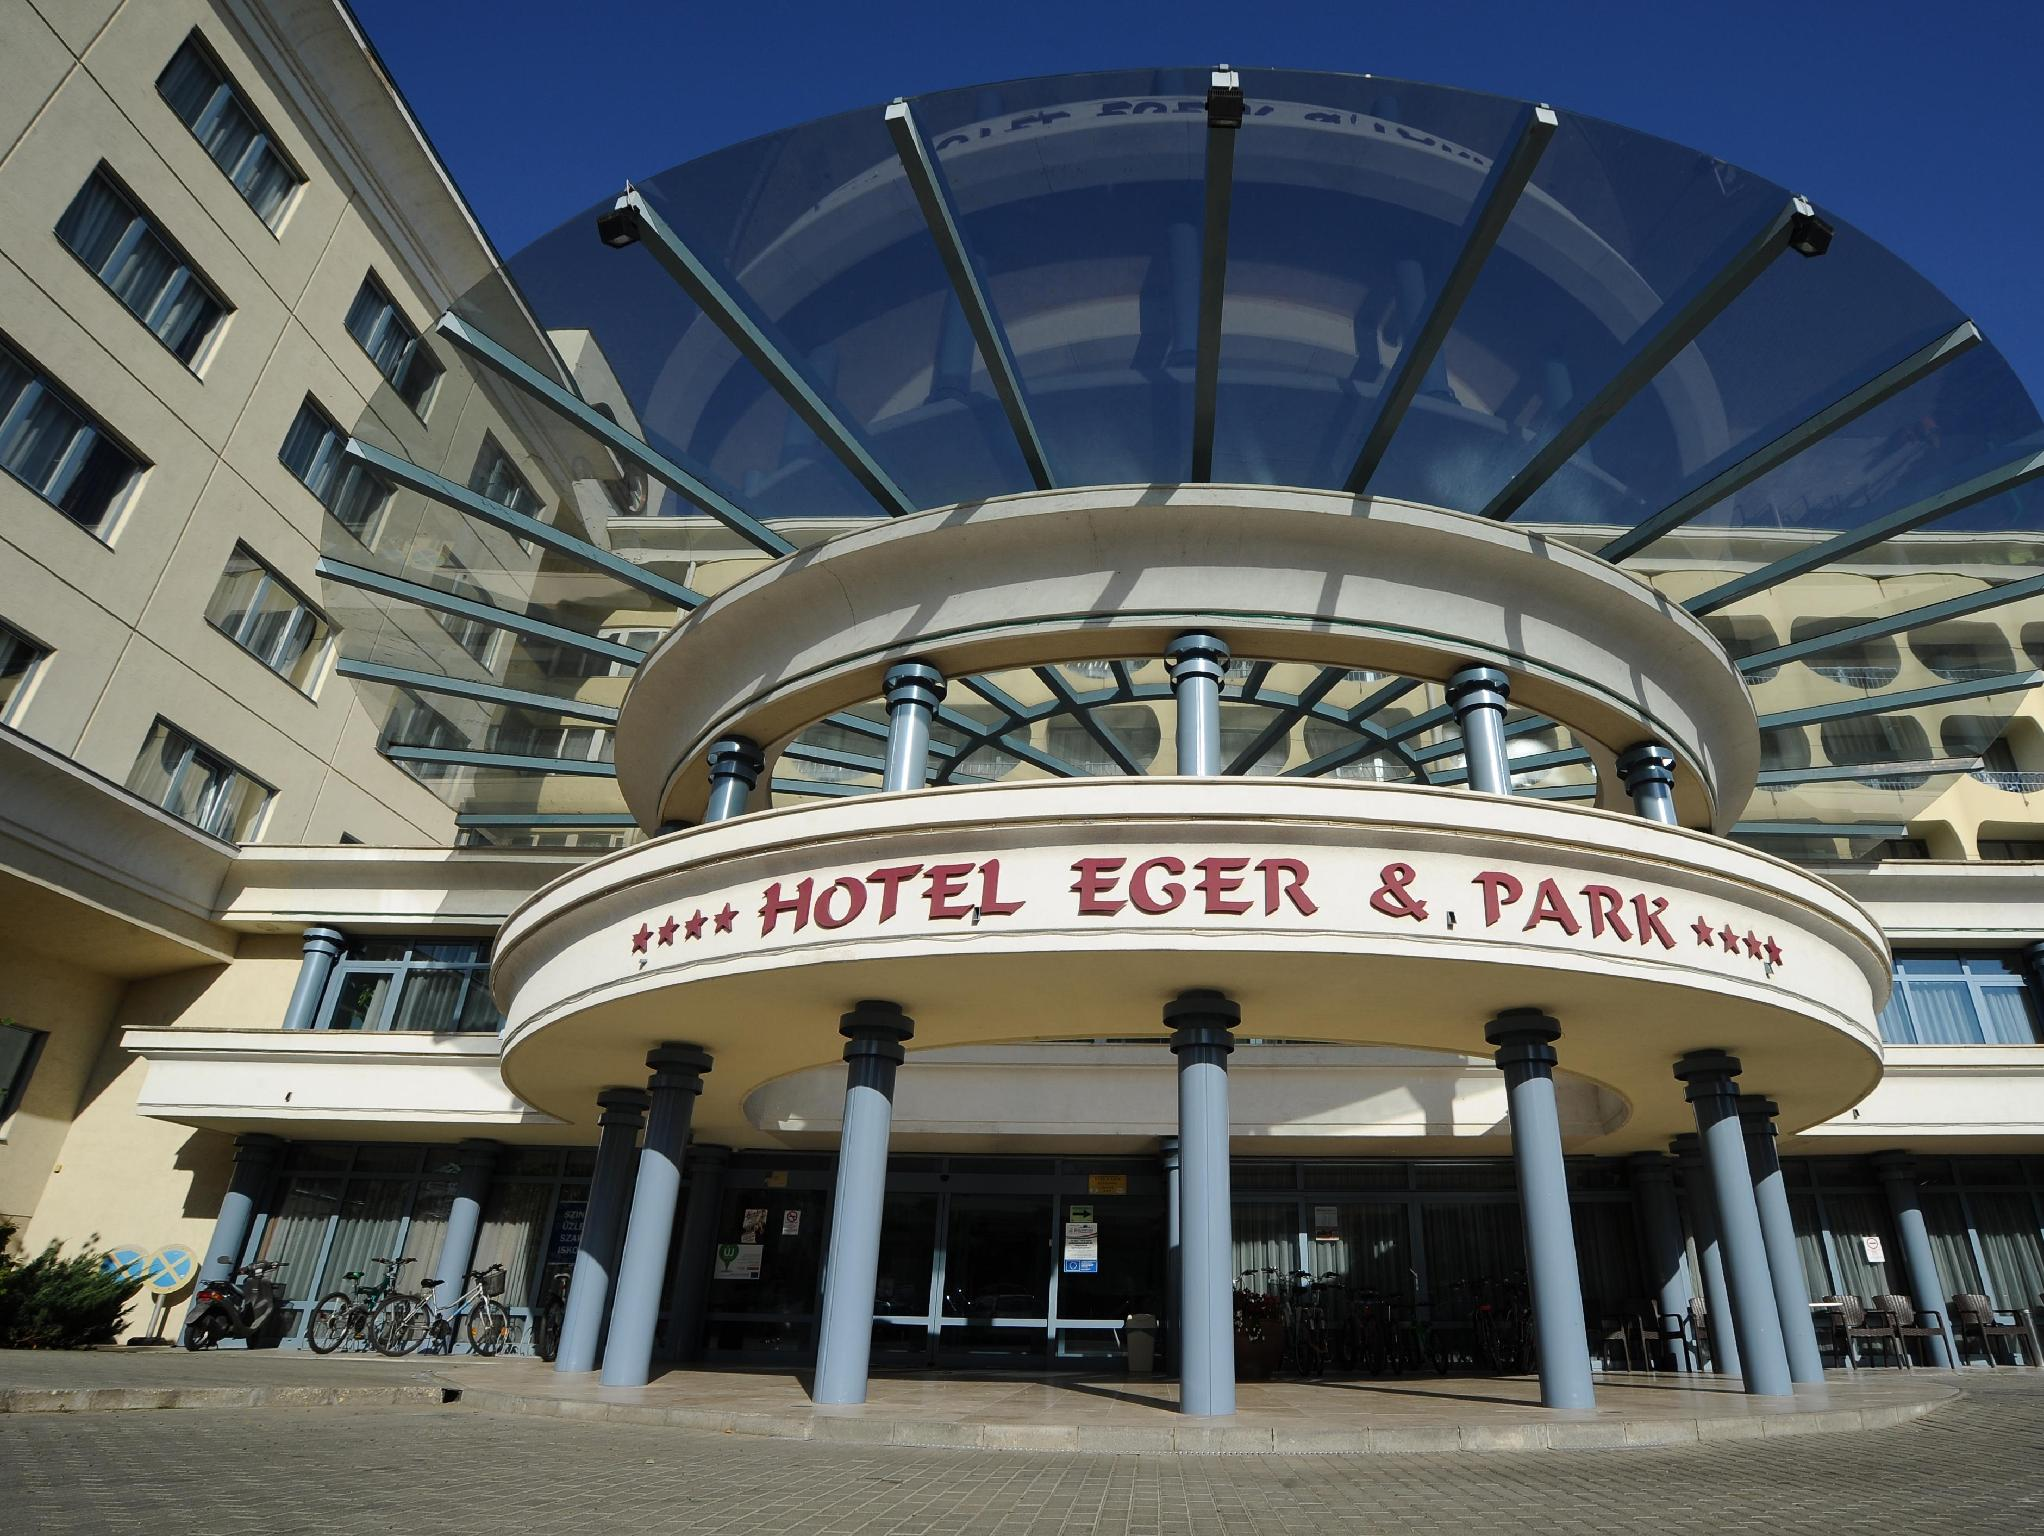 Hotel Eger Superior & Park